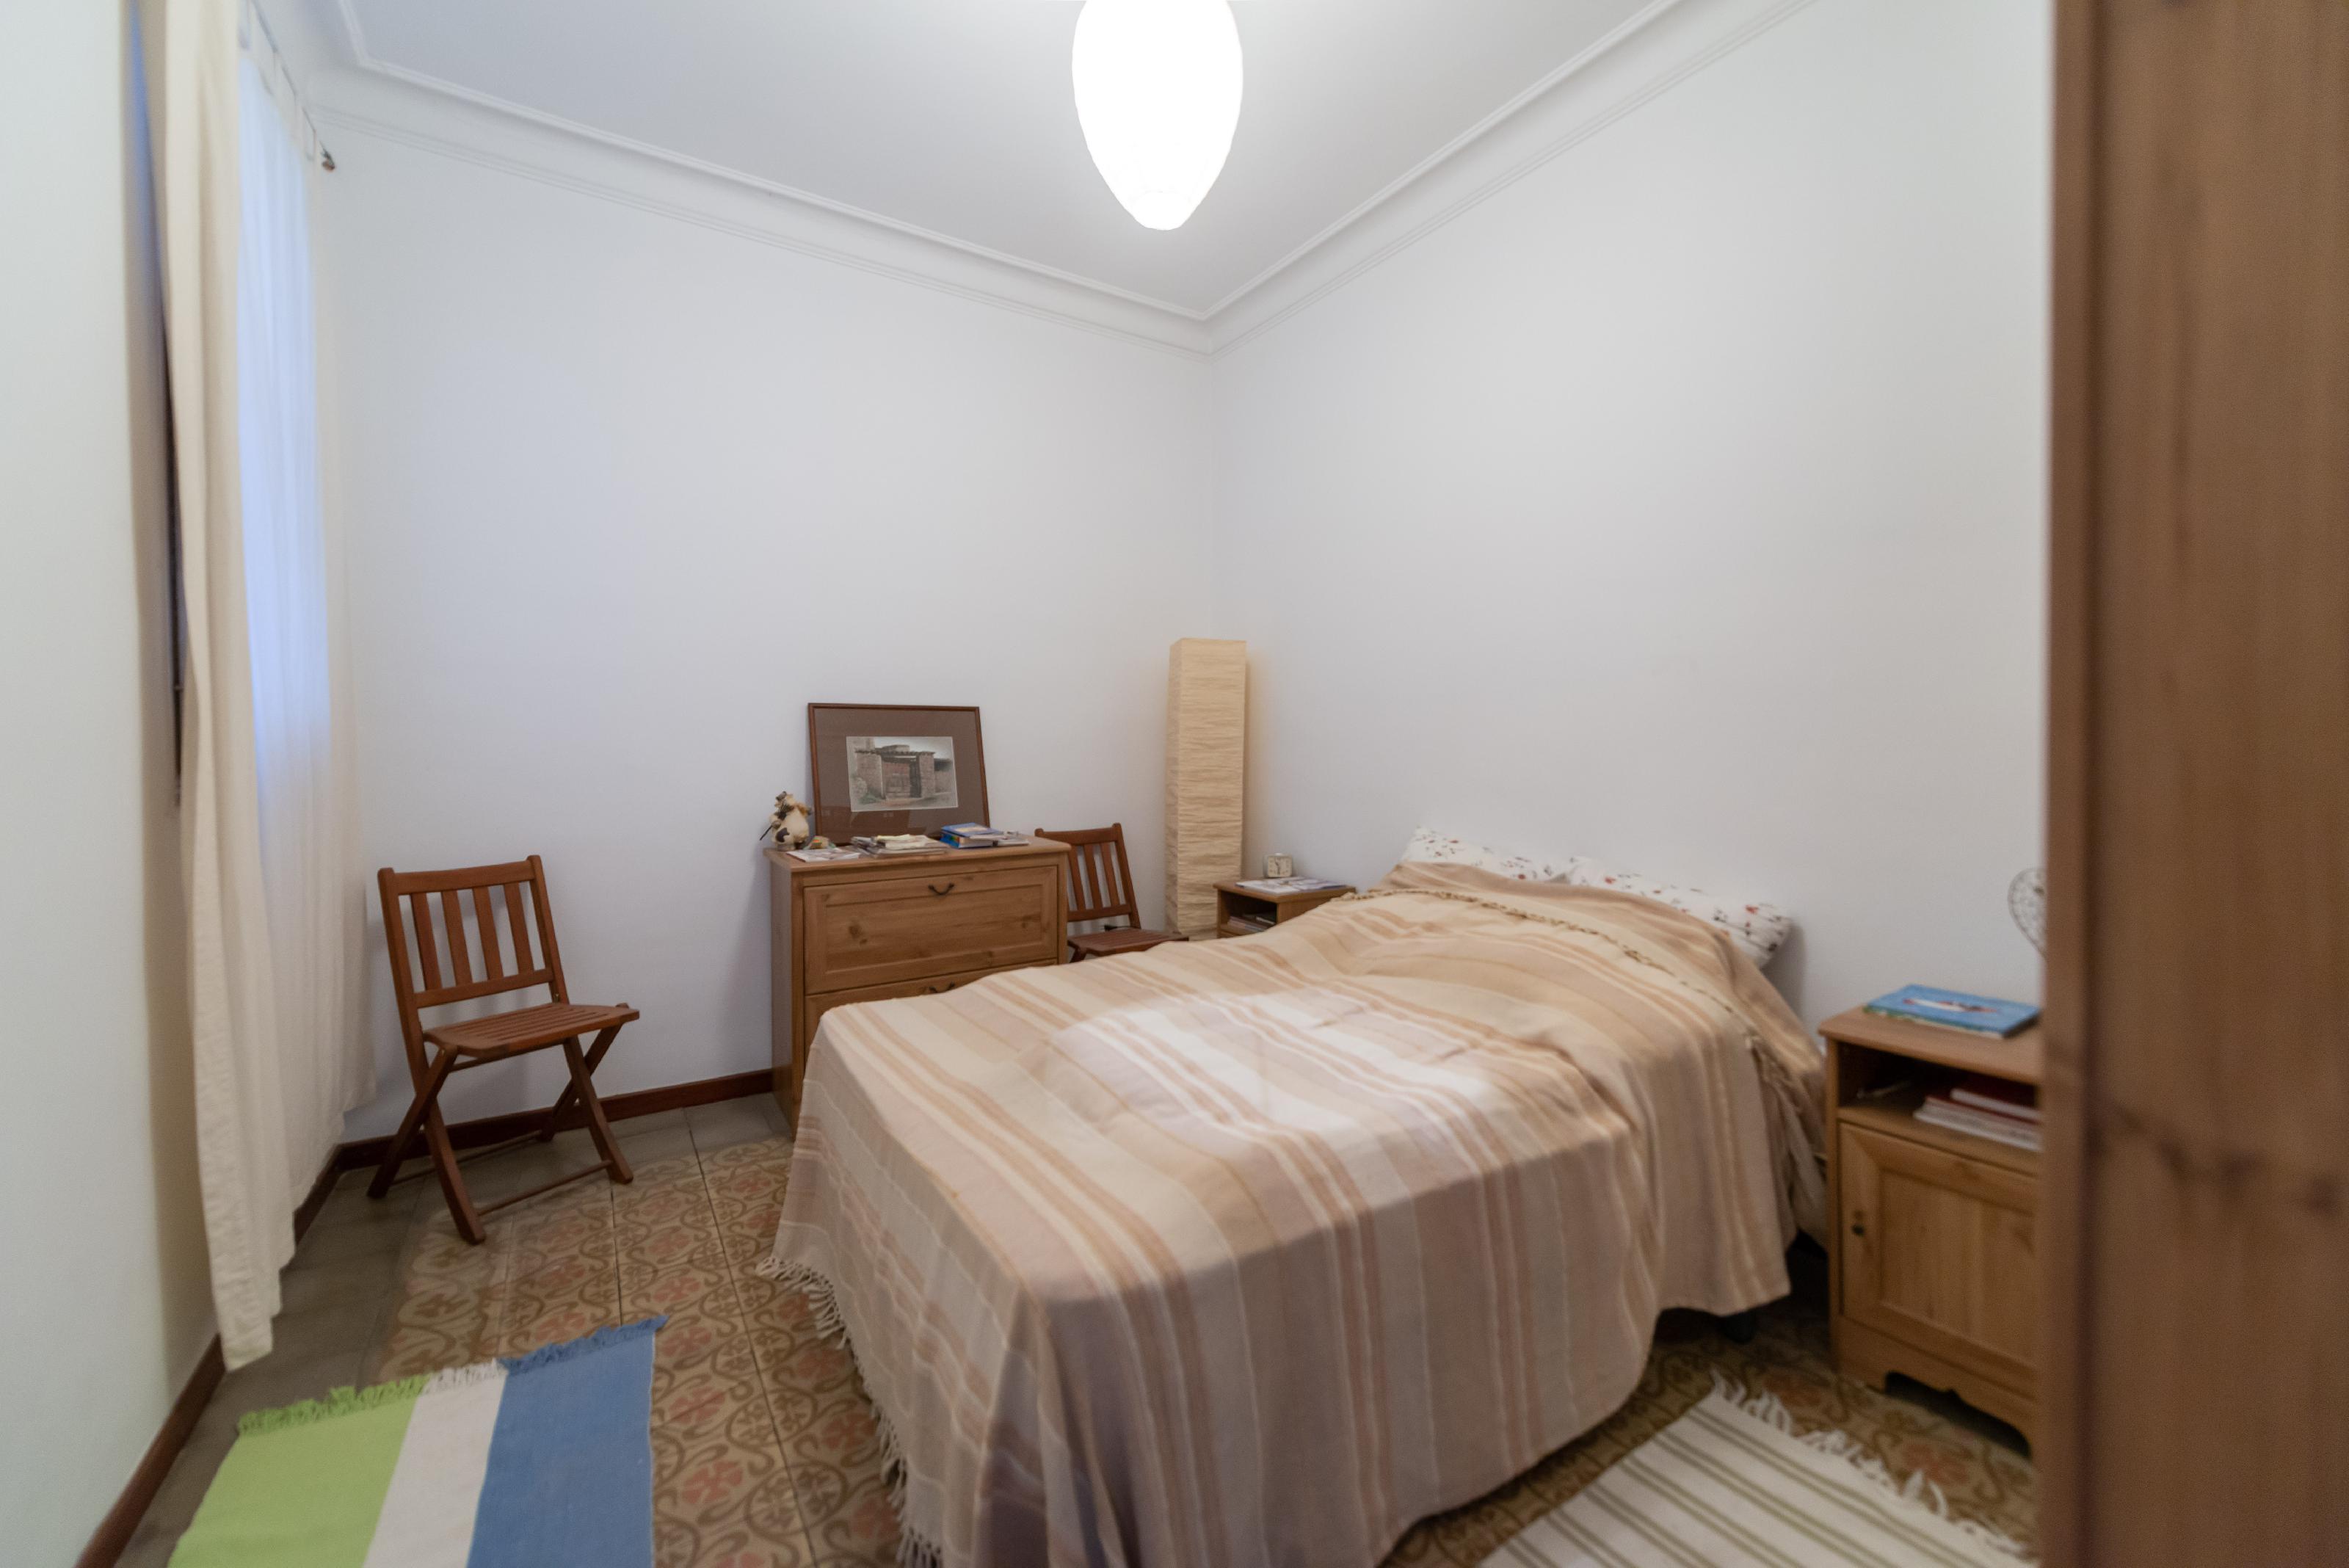 250582 Flat for sale in Sarrià-Sant Gervasi, Sant Gervasi-Galvany 11